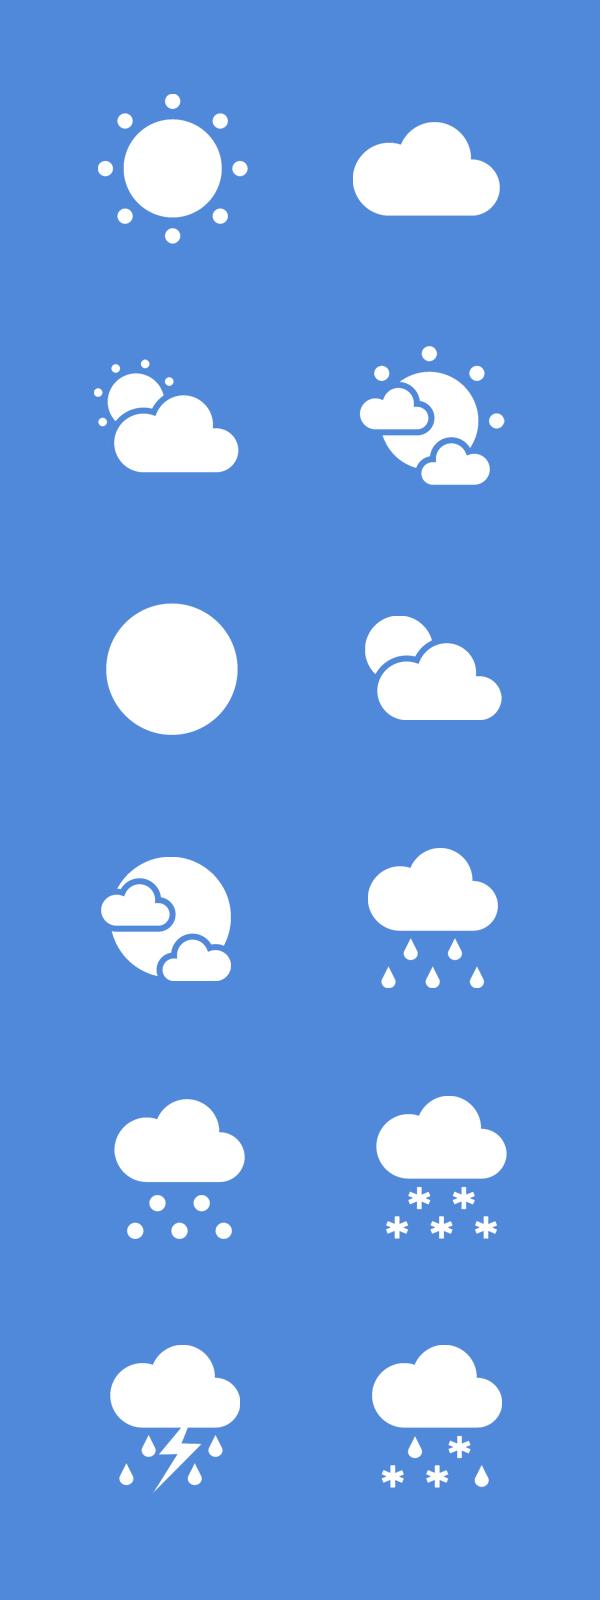 Free PSD- Flat Weather Icons-Sunny Cloudy Rain Sleet Icons